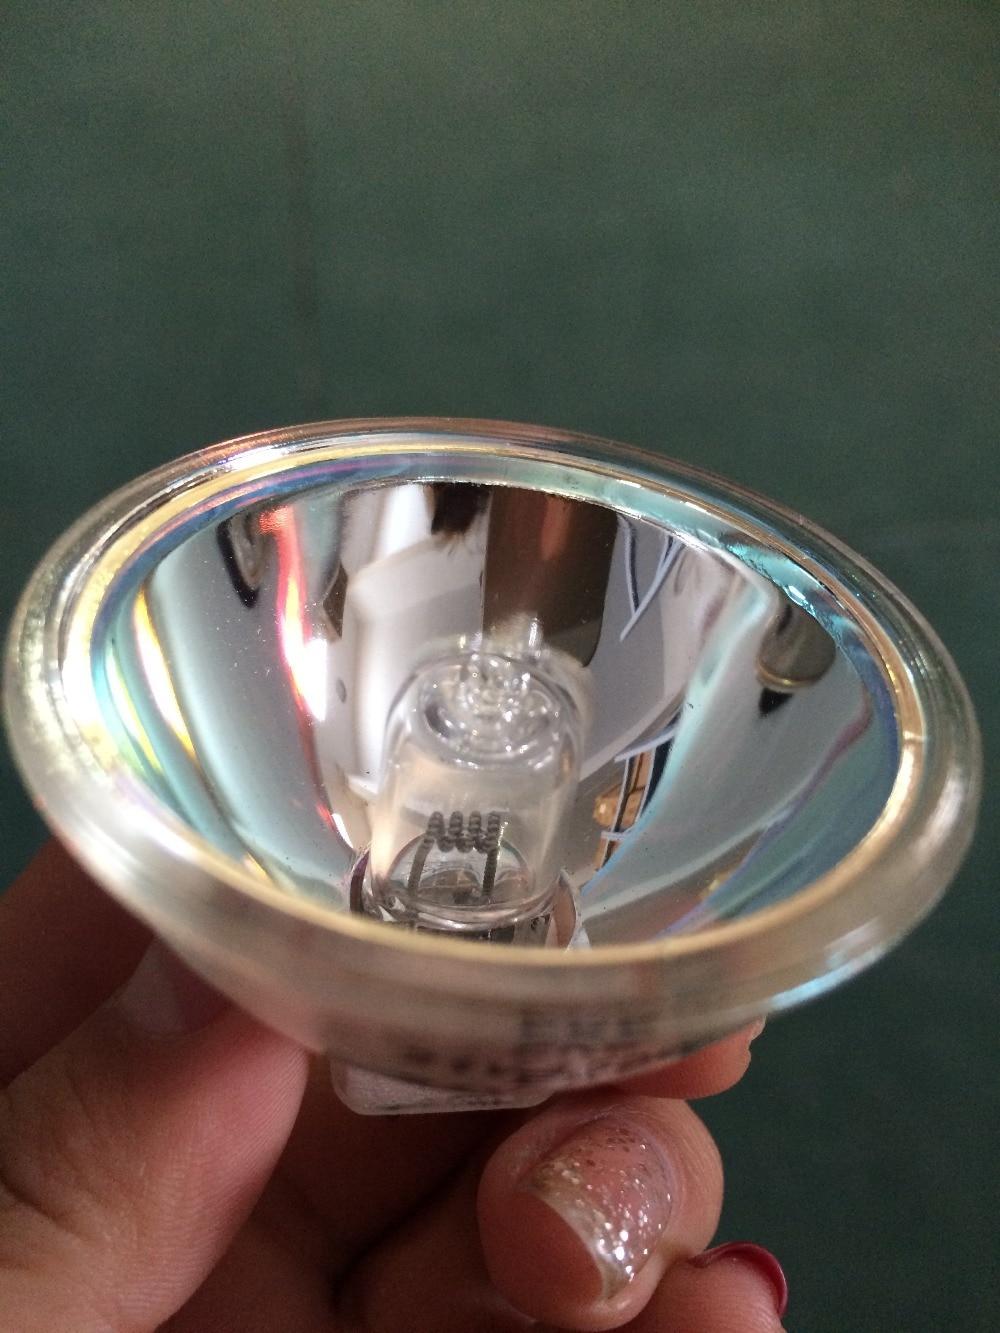 changsheng eke 21v 150w mr16 gx5 3 base fiber optics bulb microscope light eke lamp in halogen. Black Bedroom Furniture Sets. Home Design Ideas